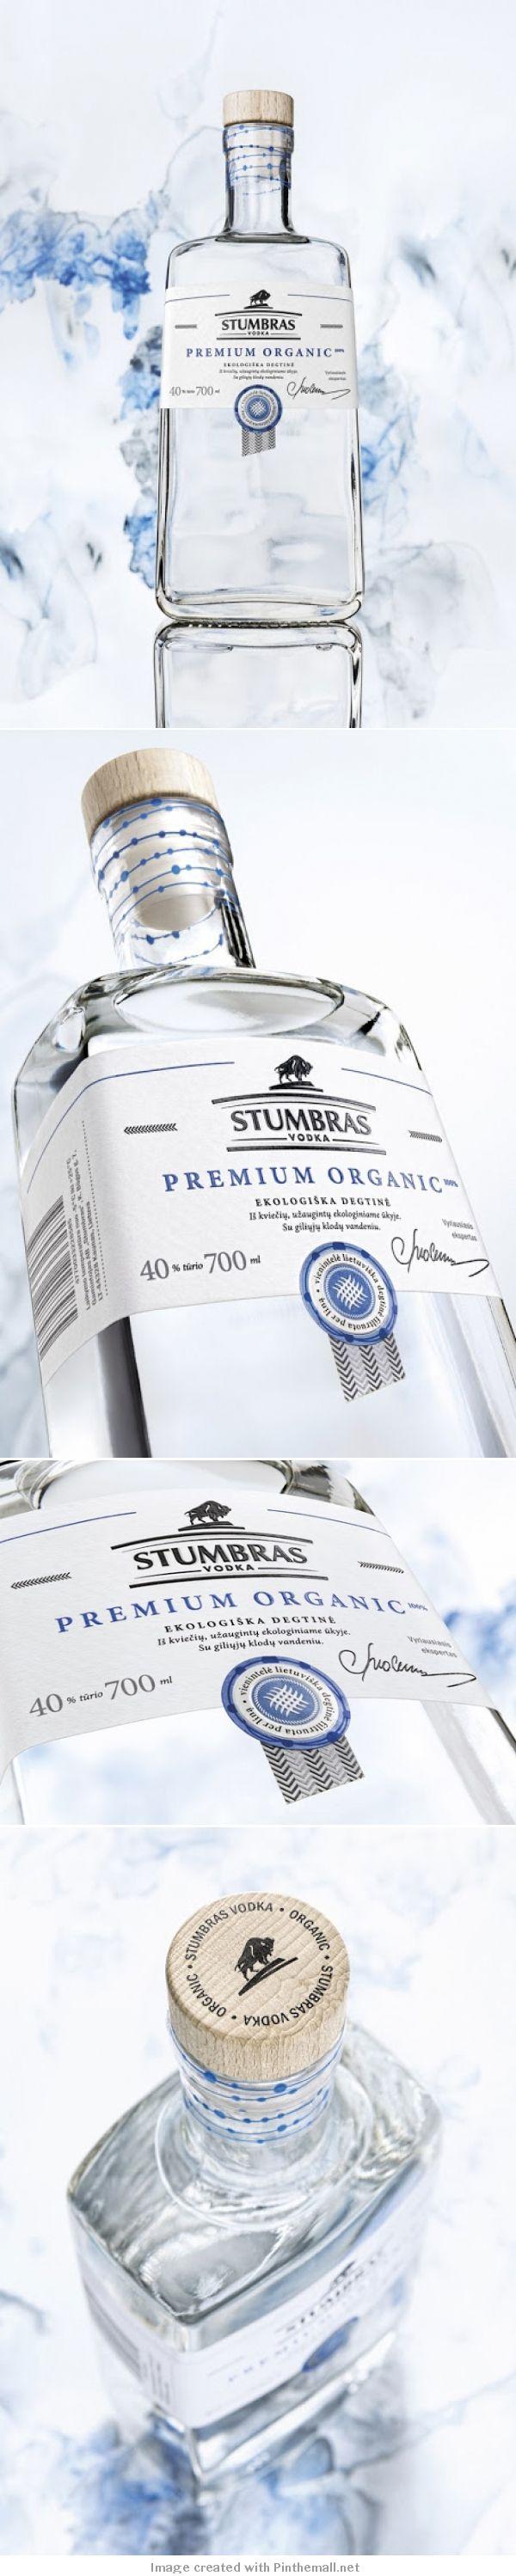 Stumbras Vodka Premium Organic Art direction, design: Edvardas Kavarskas Product development department manager: Jūratė Paulauskienė Product development manager: Artūras Kazlauskas Copywriter: Daiva Grikinienė Photographer: Edgaras Marozas Aquarelle PD